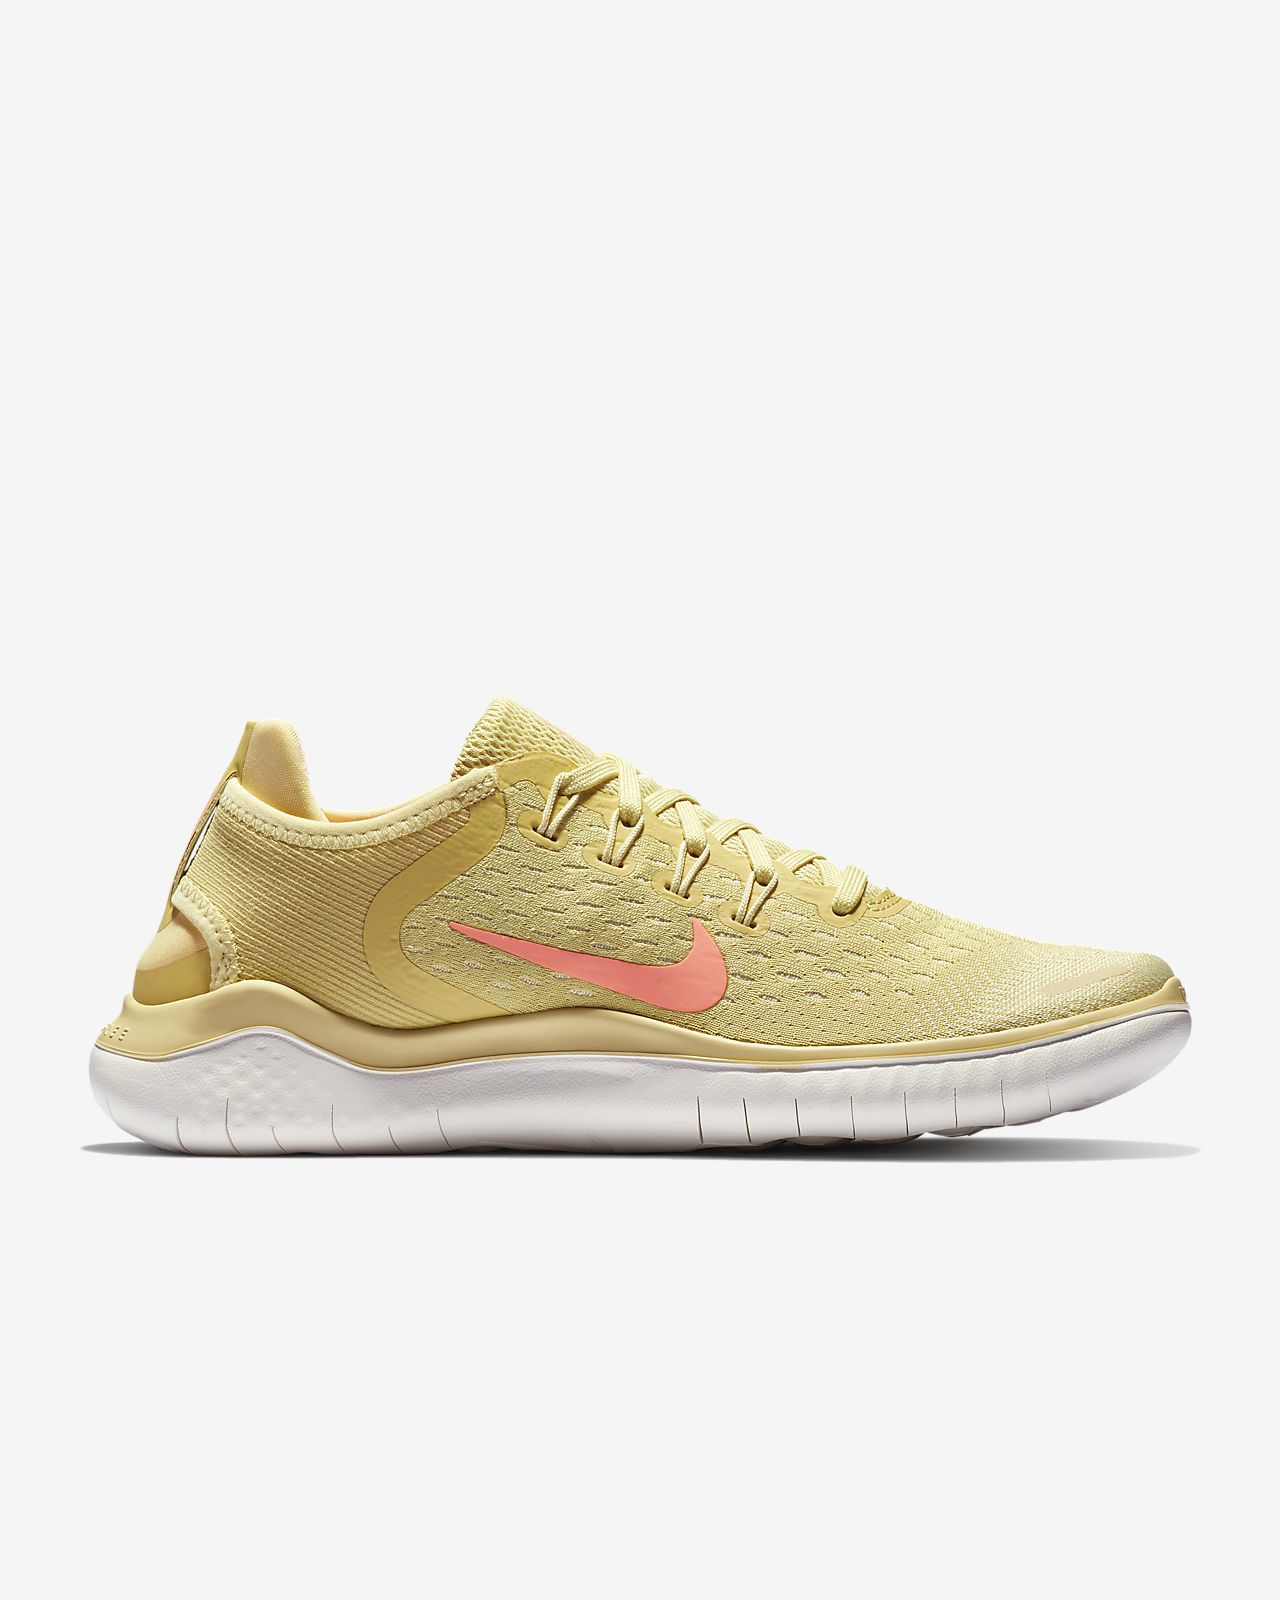 ... Nike Free RN 2018 Summer Women's Running Shoe